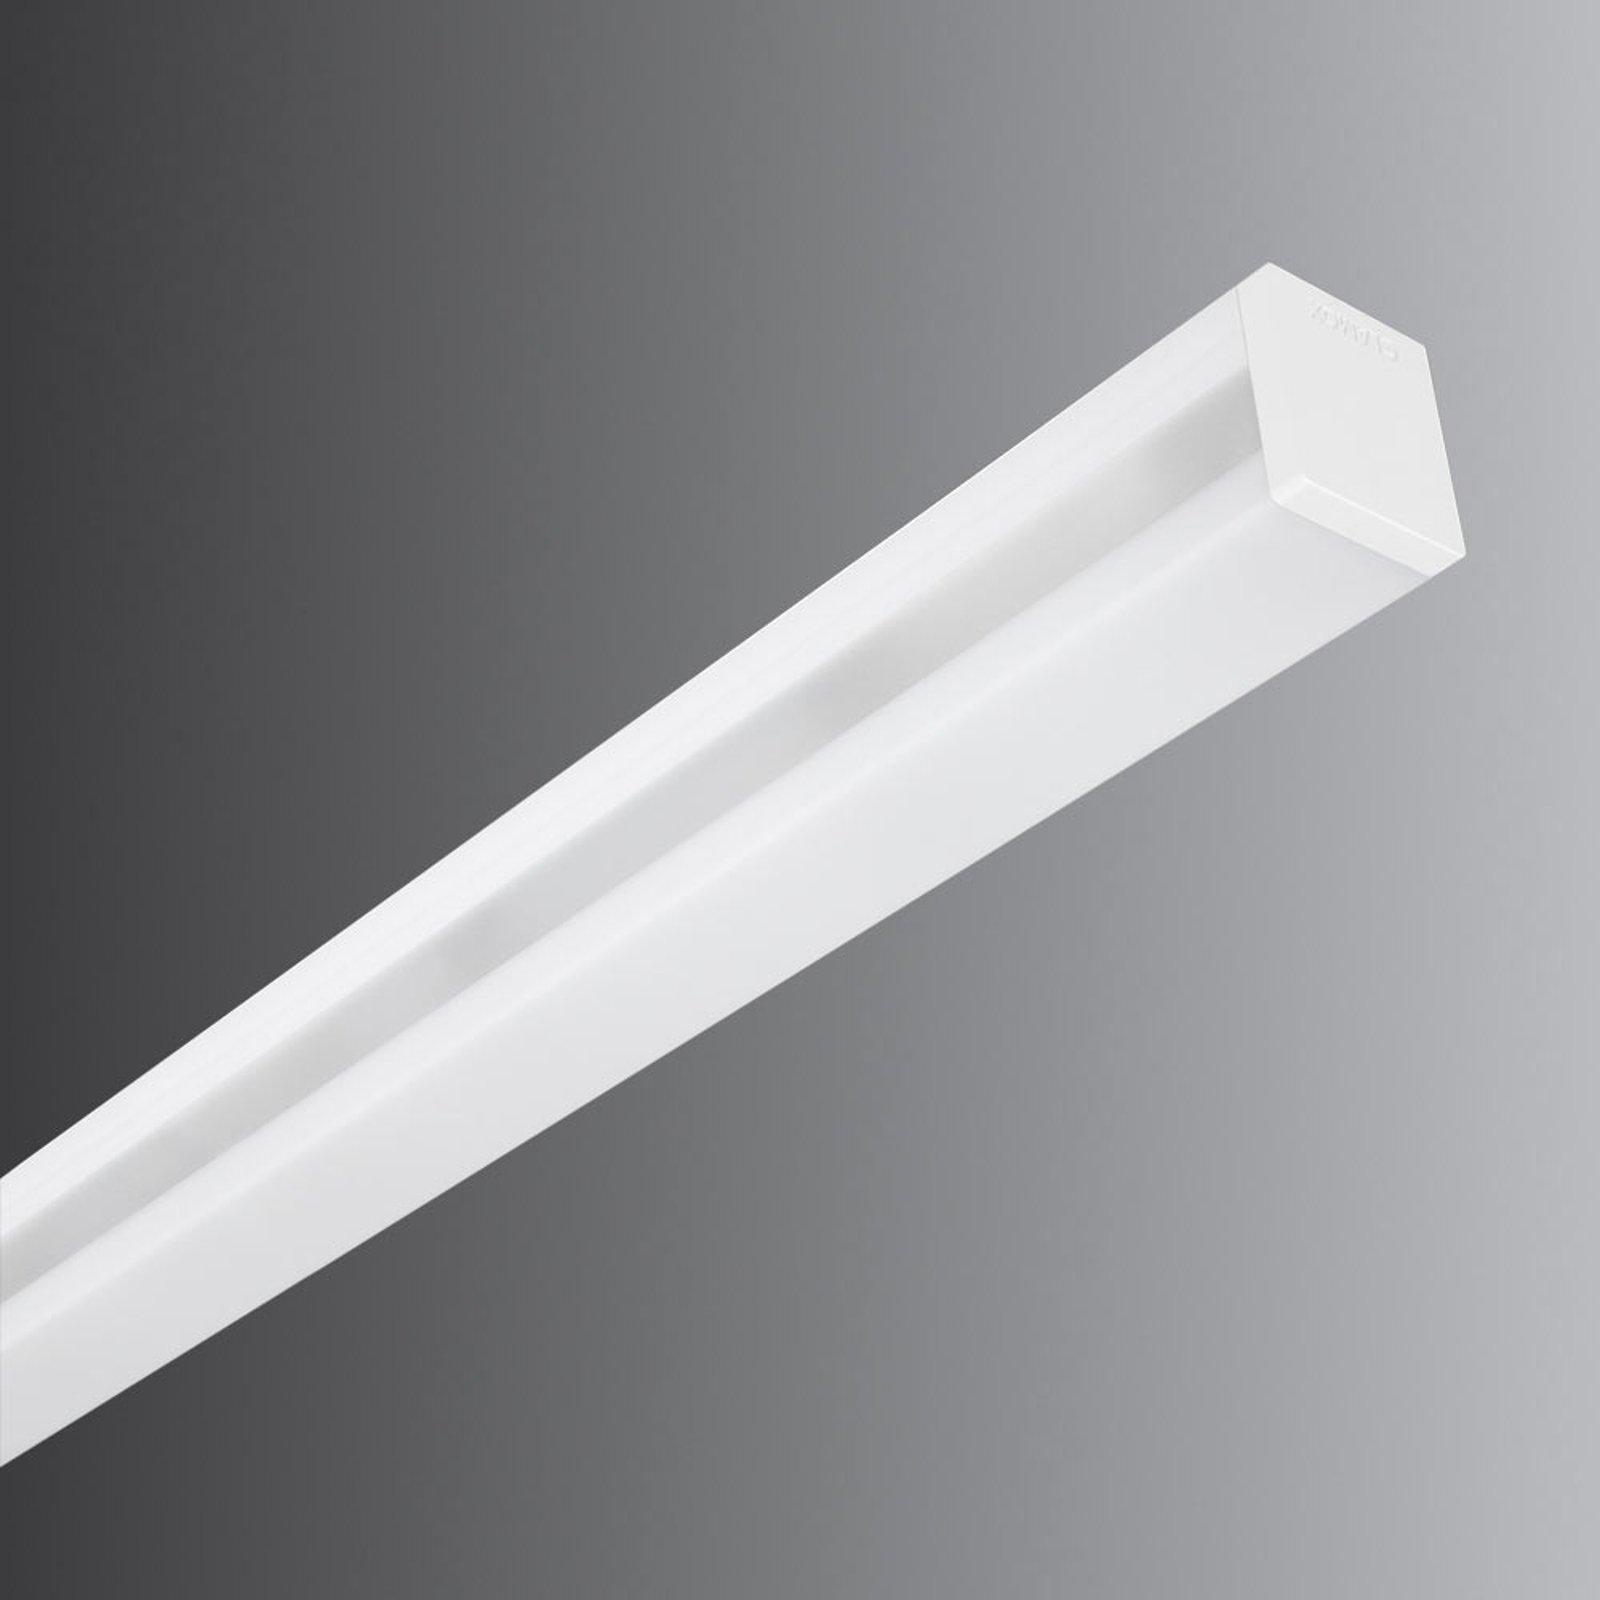 16 W LED speillampe A40-W1200 2100HF 120 cm 3 000